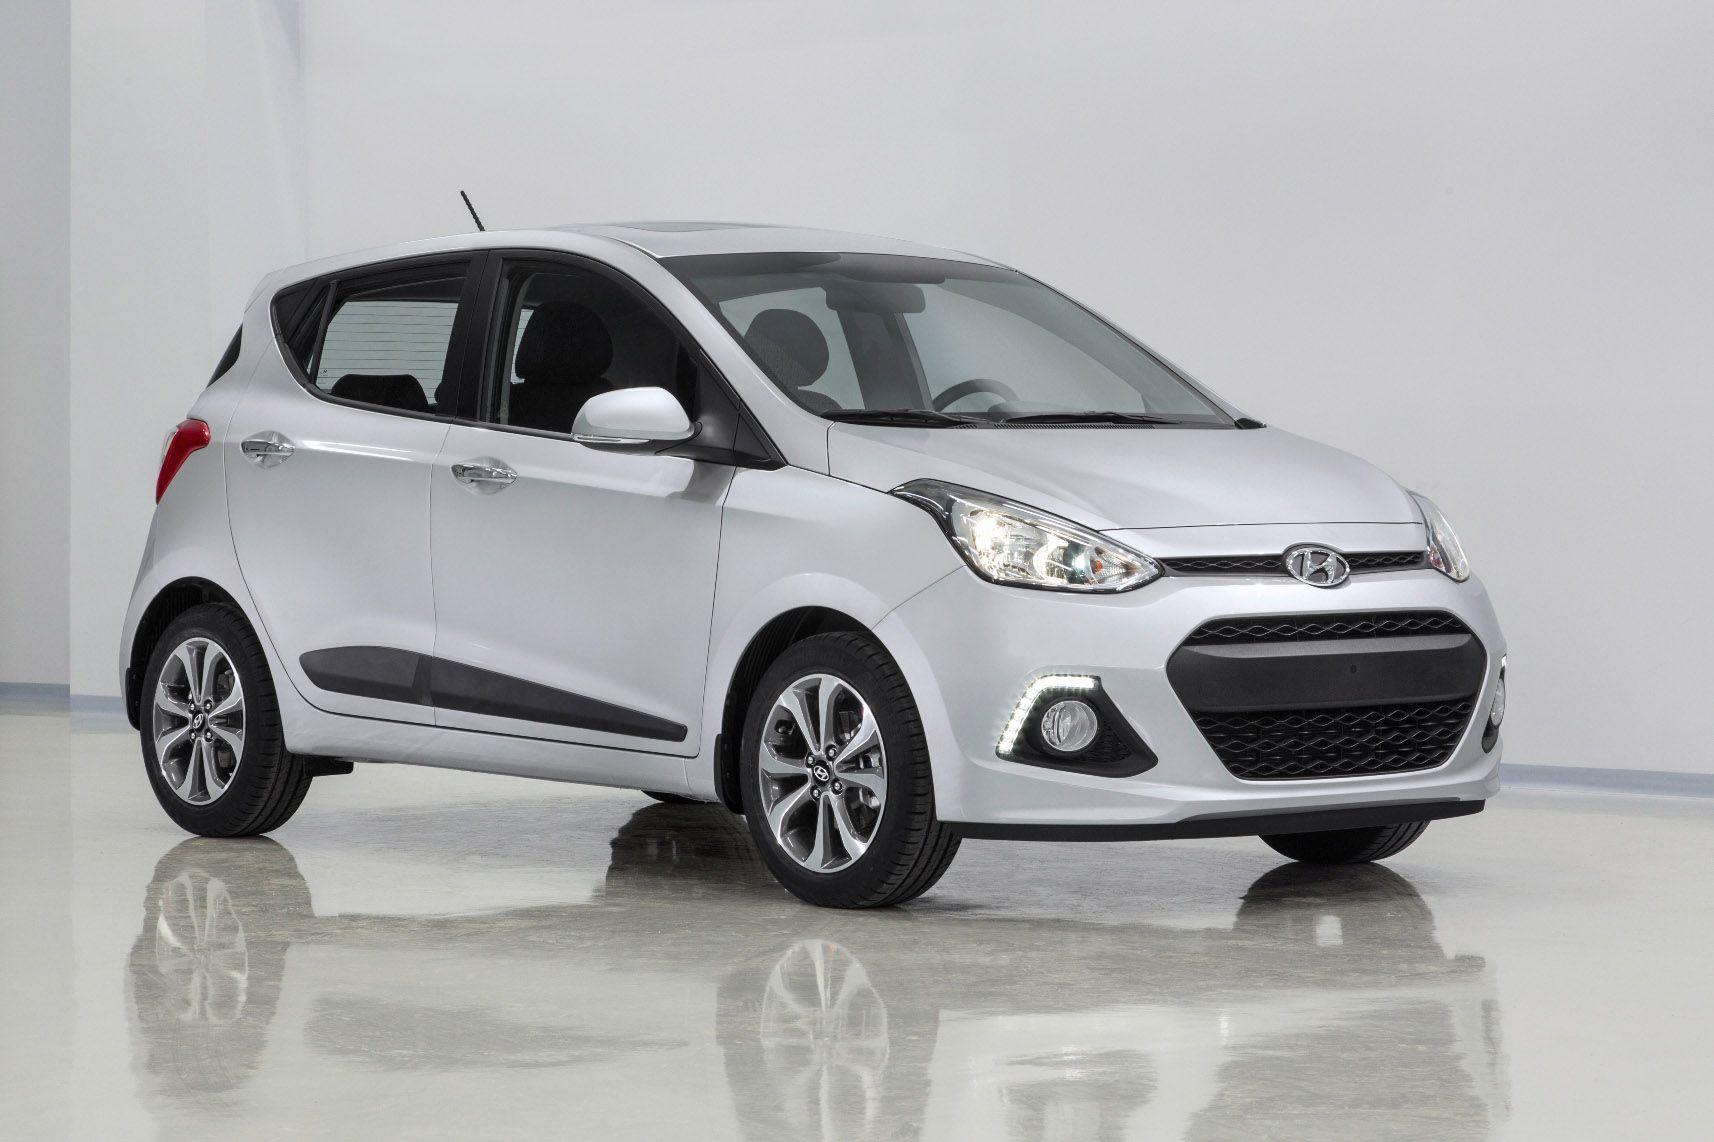 Hyundai Minik Sinif Otomobili I1o Ingiltere Nin En Prestijli Ve